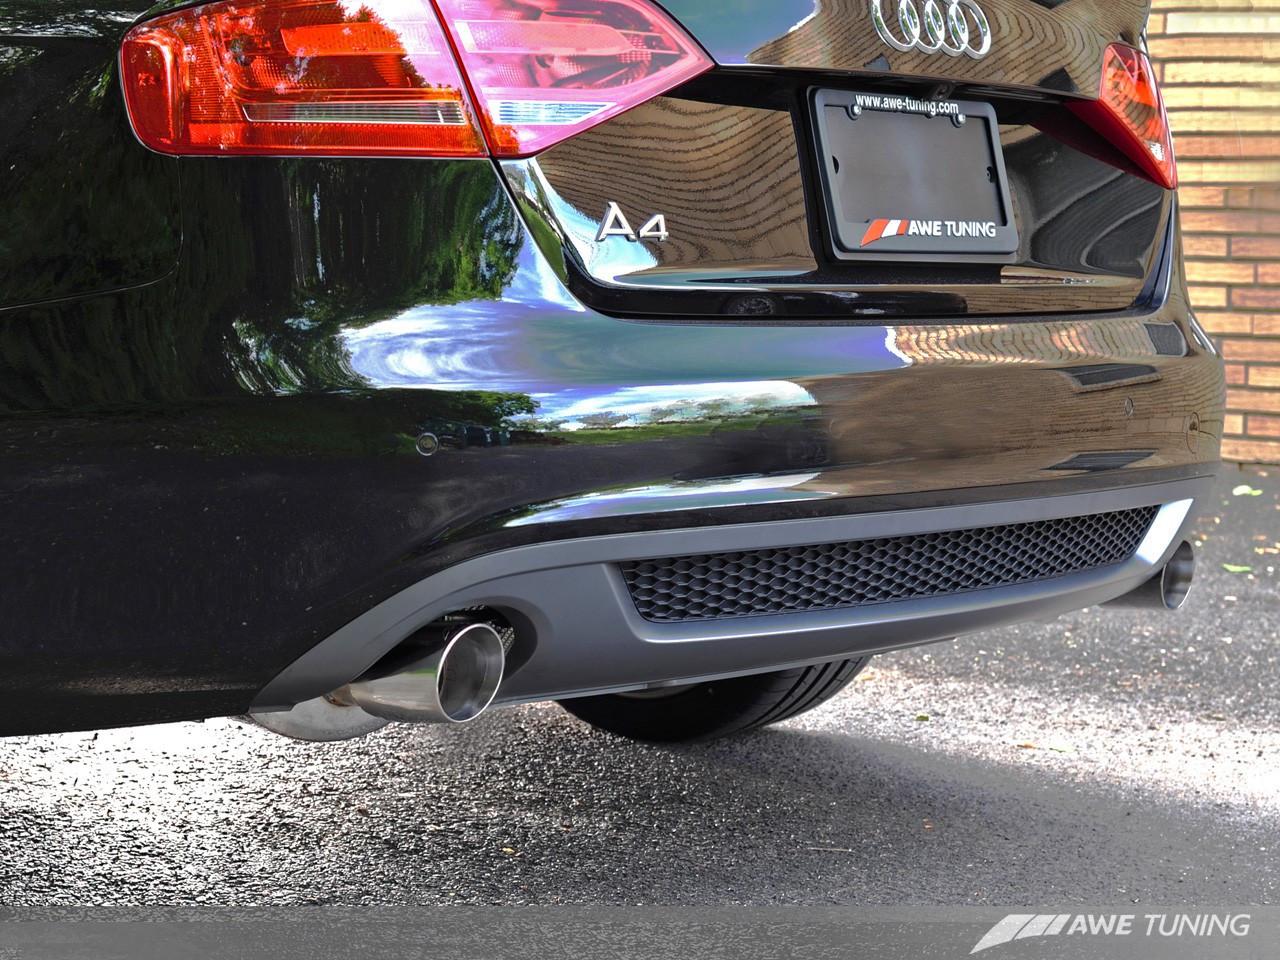 Awe Tuning Audi A4 B8 3 2fsi Touring Edition Exhaust Awe Tuning Europe